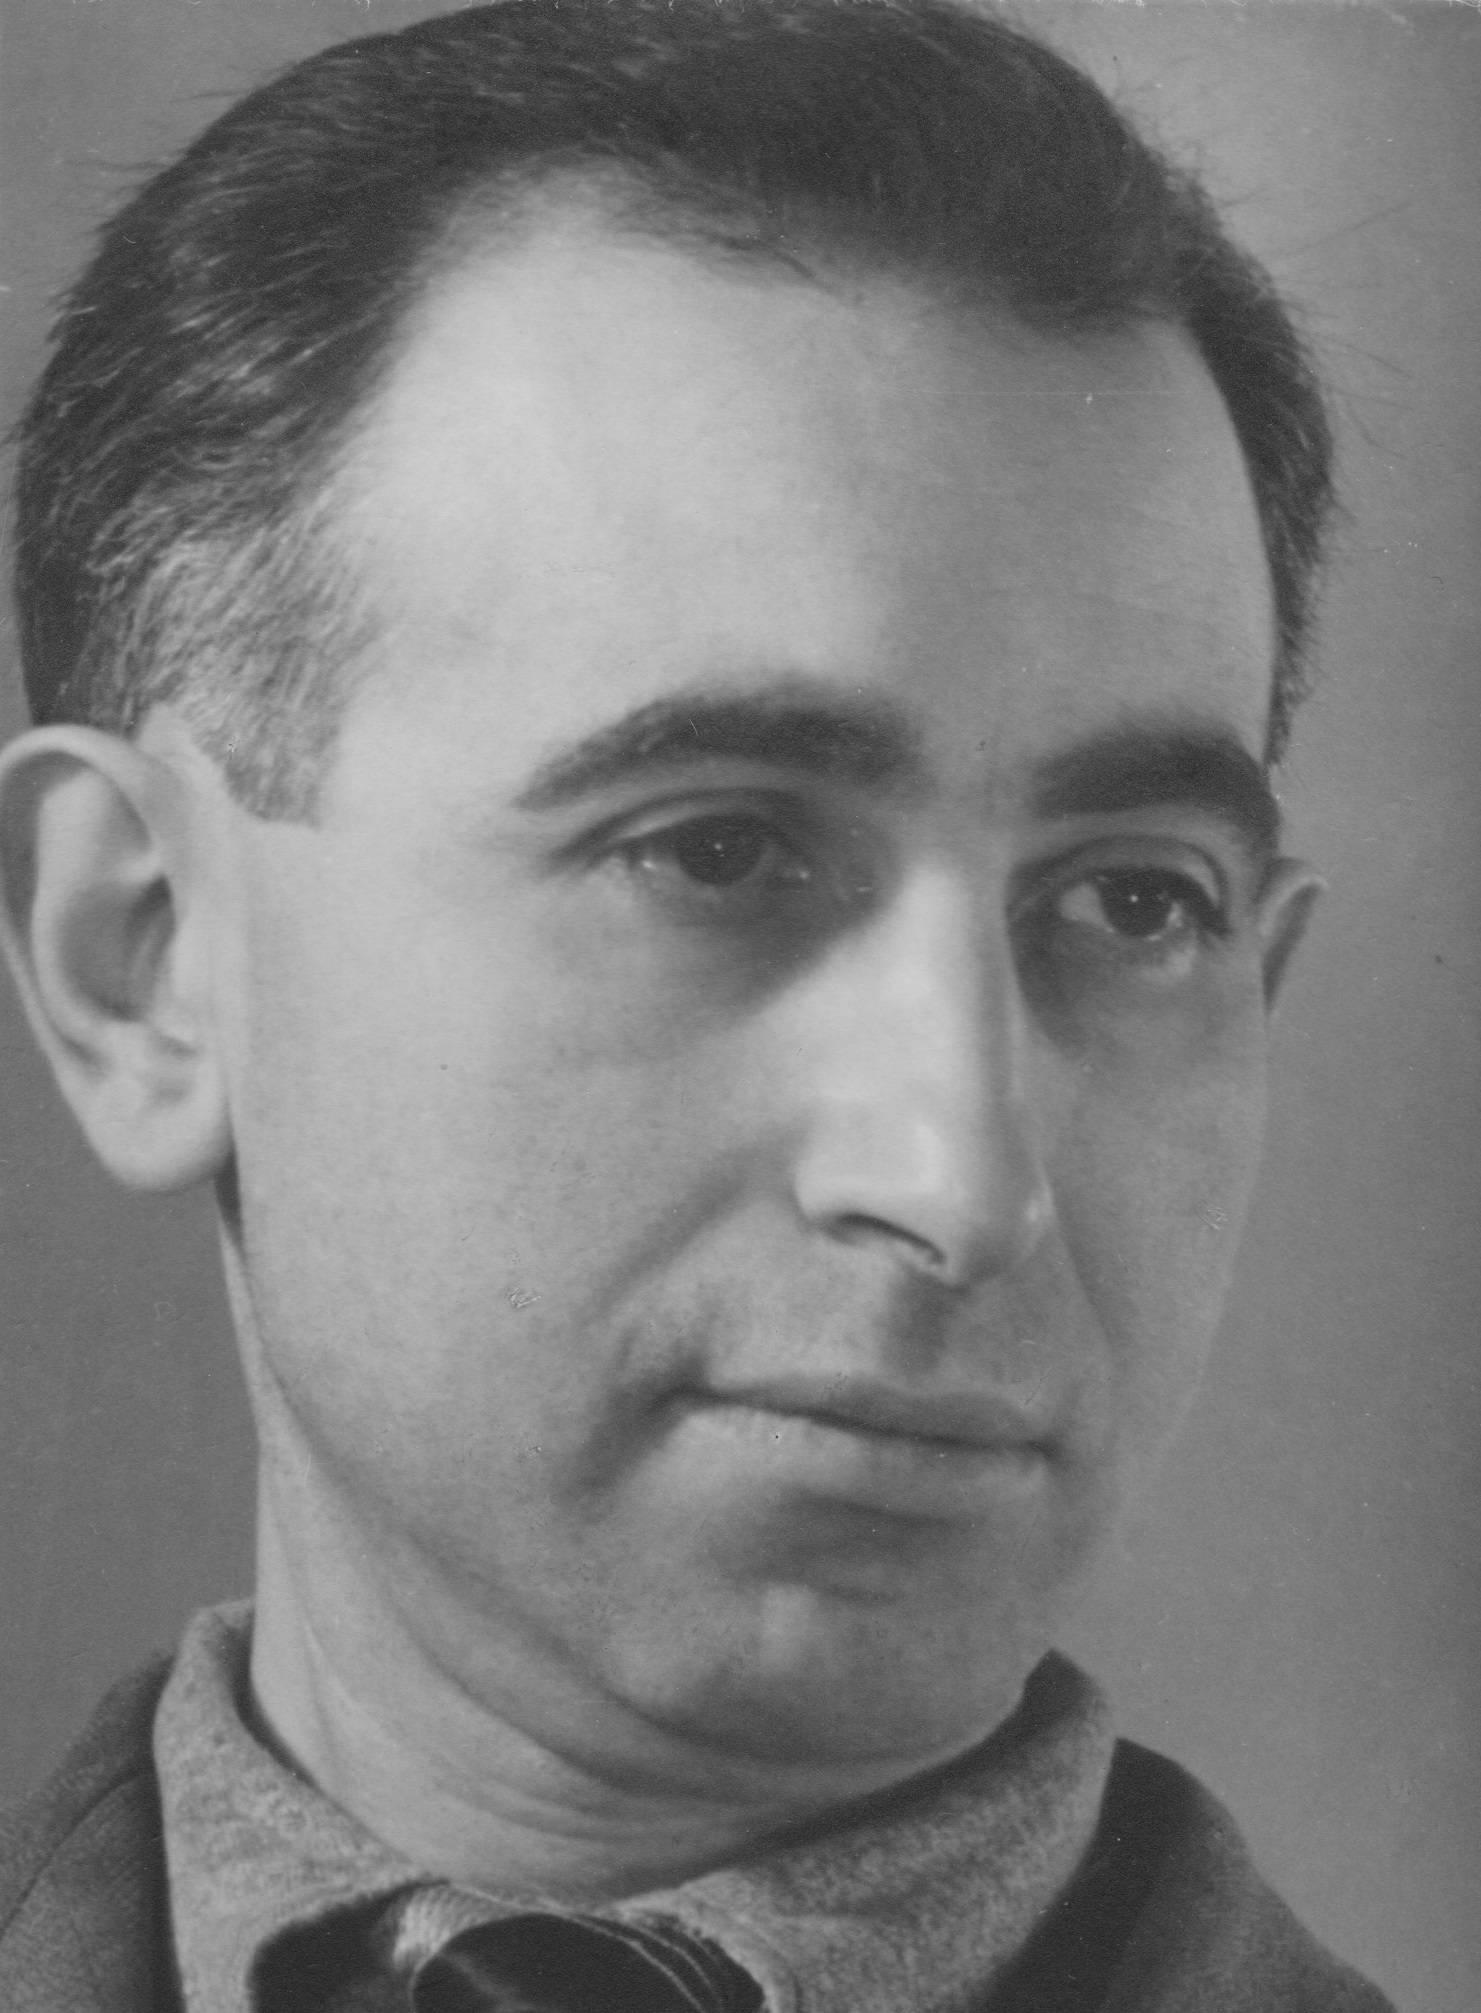 Kurt Noah op 28 januari 1945 in kamp Westerbork.